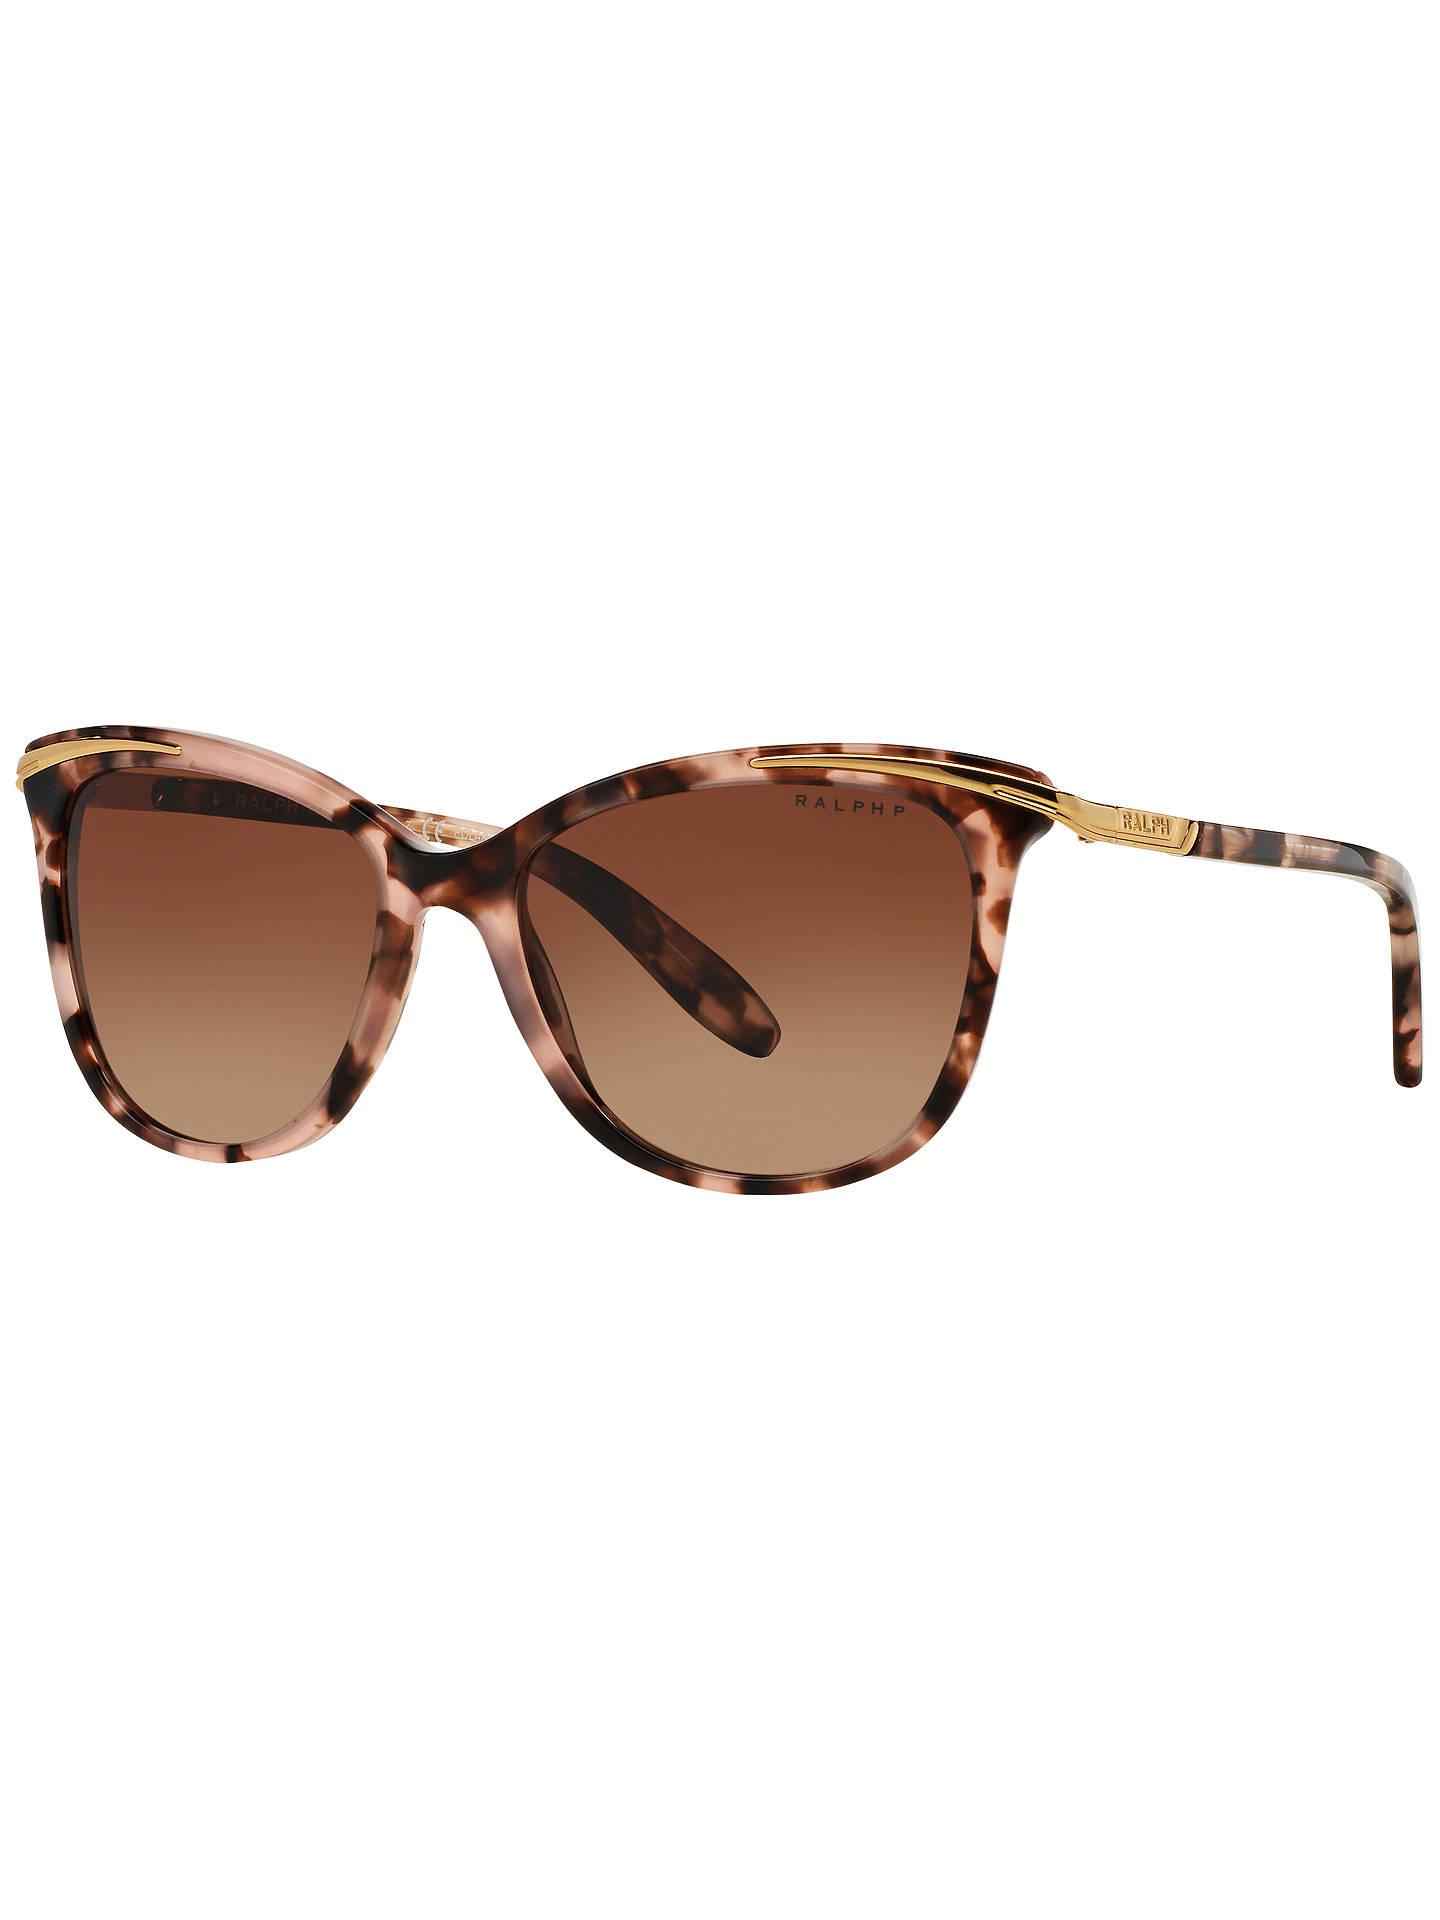 10e7dcad300 BuyRalph RA5203 Polarised Cat s Eye Sunglasses